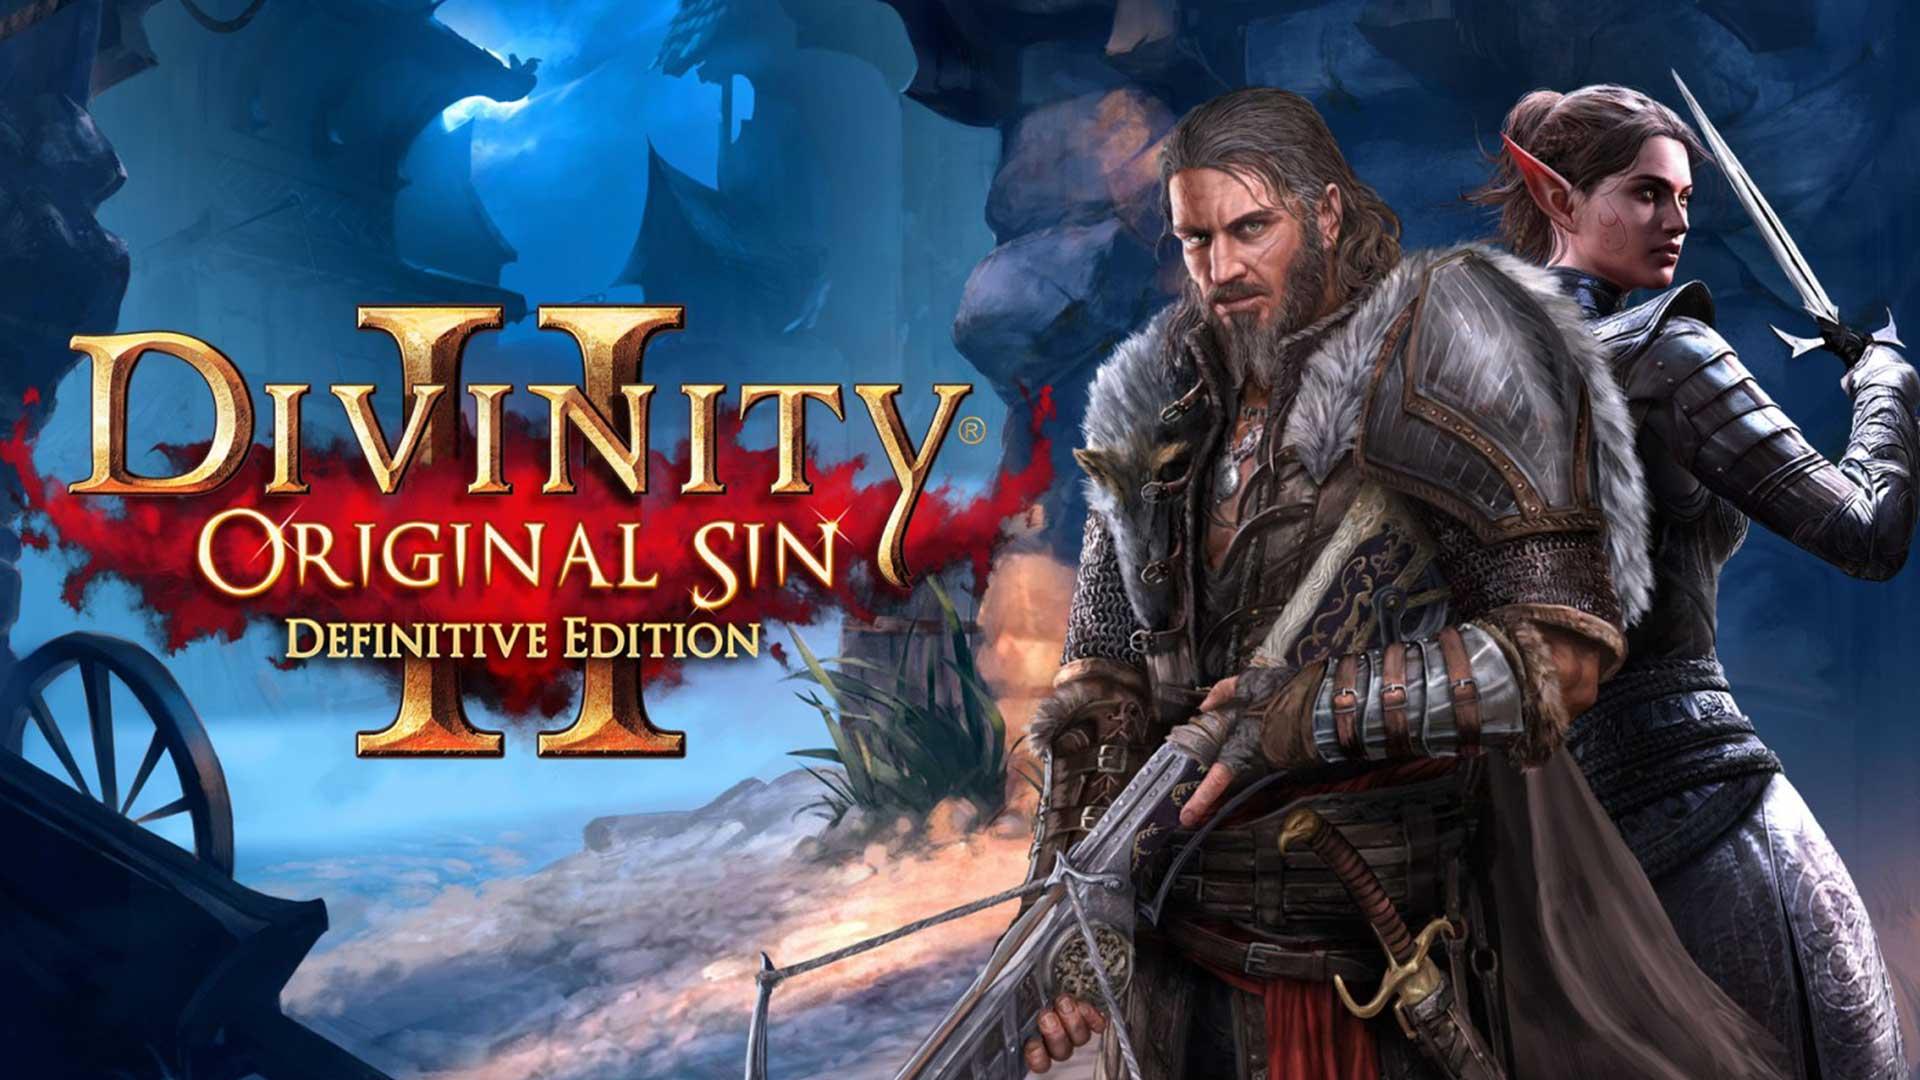 ivinity: Original Sin 2